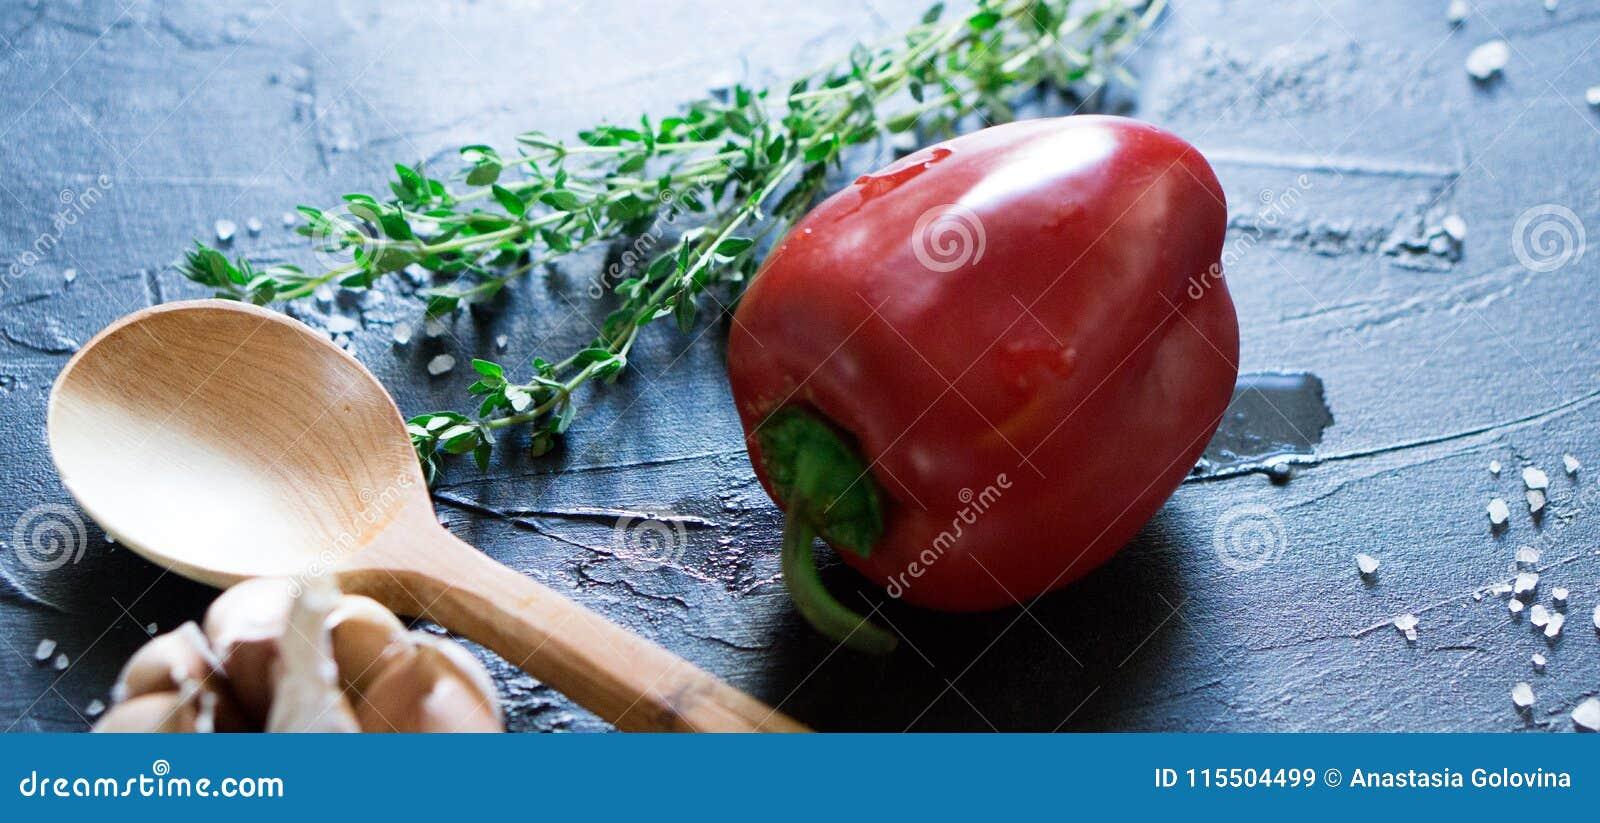 Comida búlgara o húngara tradicional: paprika rellena con la carne